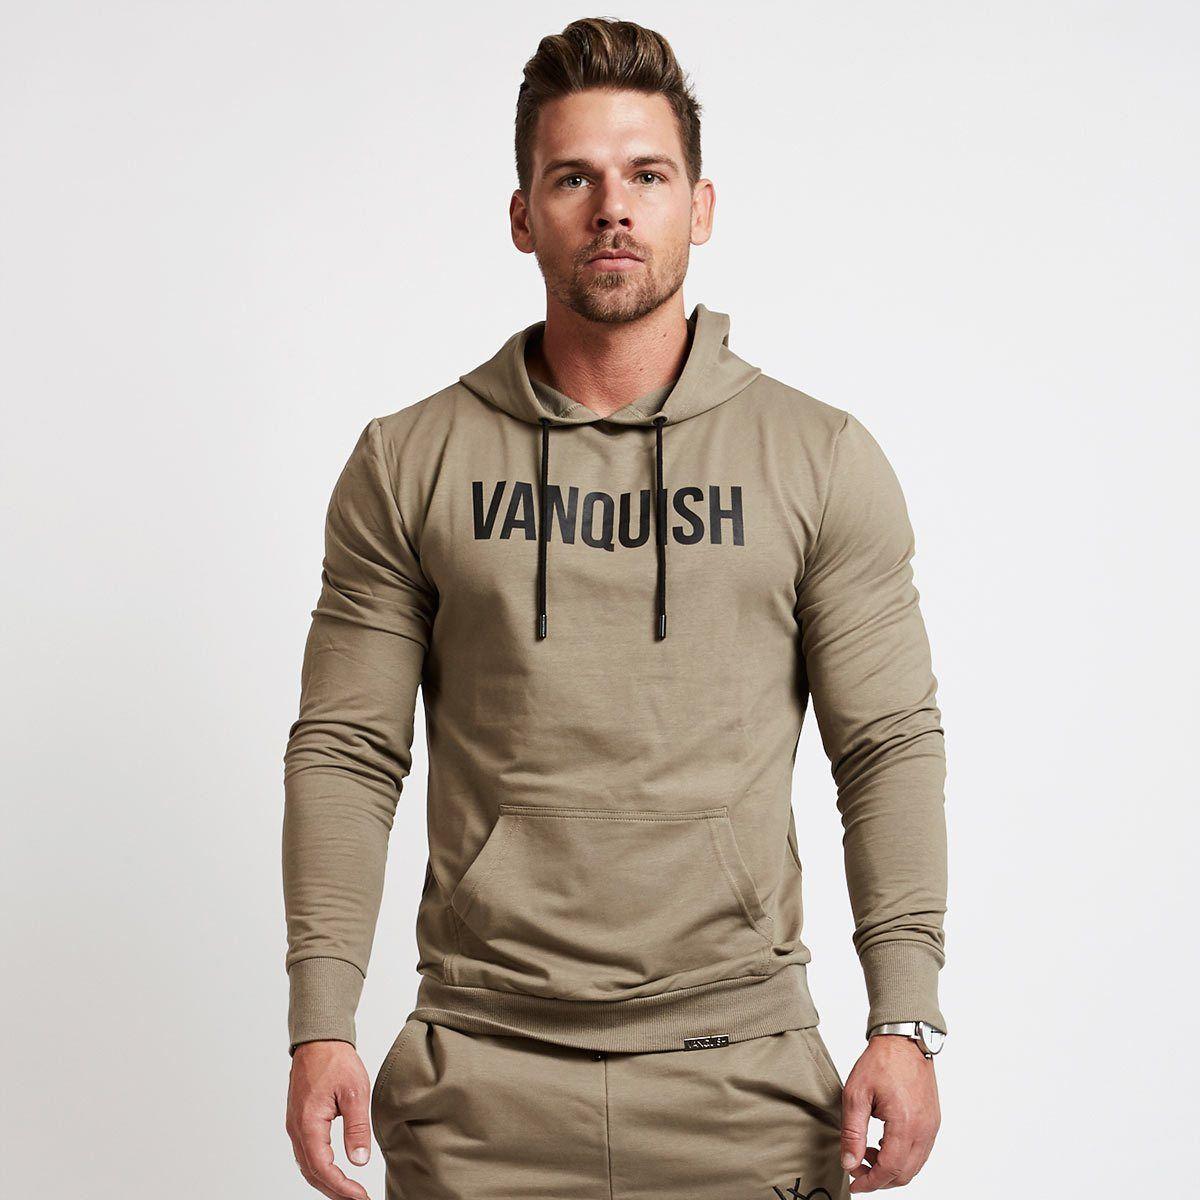 4af5cf11dd1494 Vanquish Khaki Exodus Unity Pullover Hoodie from Vanquish Fitness. Vanquish  Khaki Exodus Unity Pullover Hoodie from Vanquish Fitness Men s ...